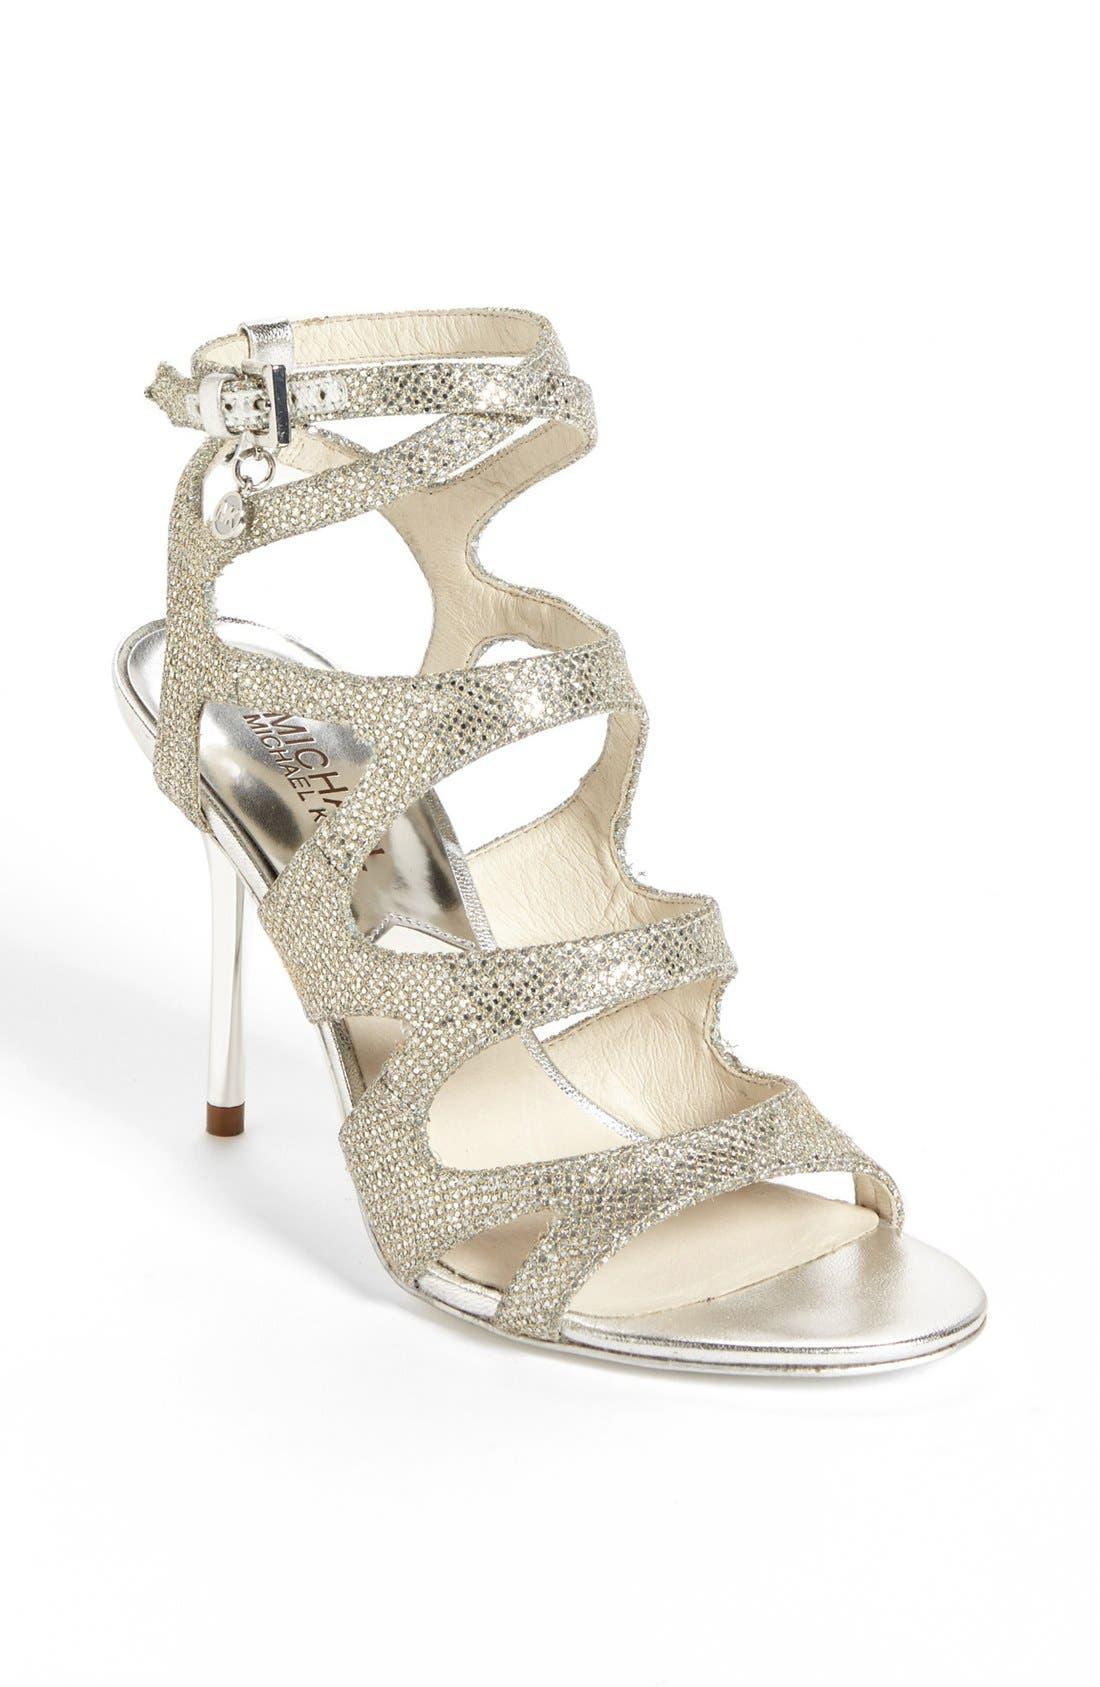 Main Image - MICHAEL Michael Kors 'Yvonne' Sandal